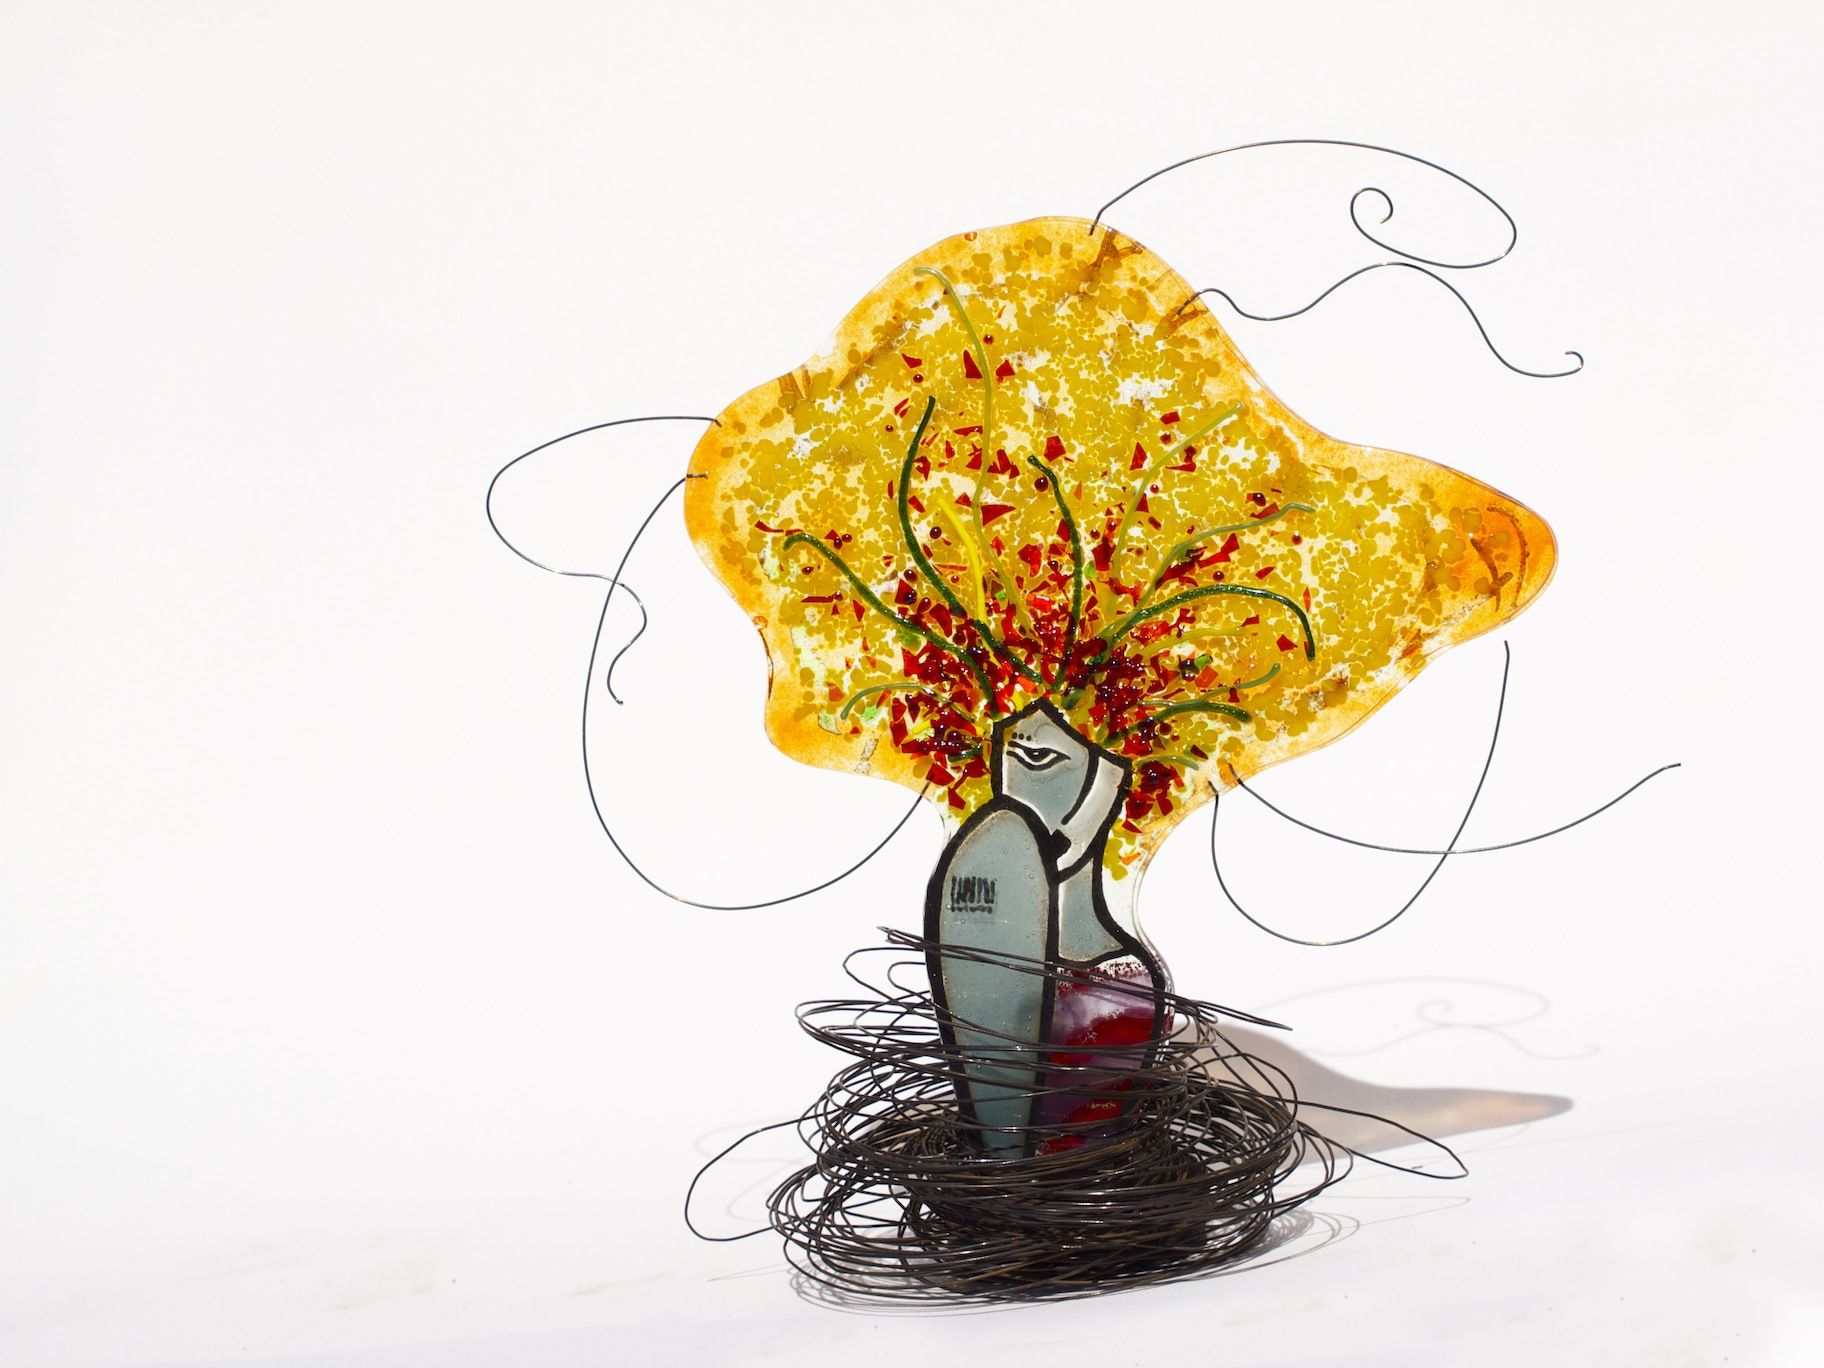 Desatada!  de Eduardo Naveira, Mayo 2014